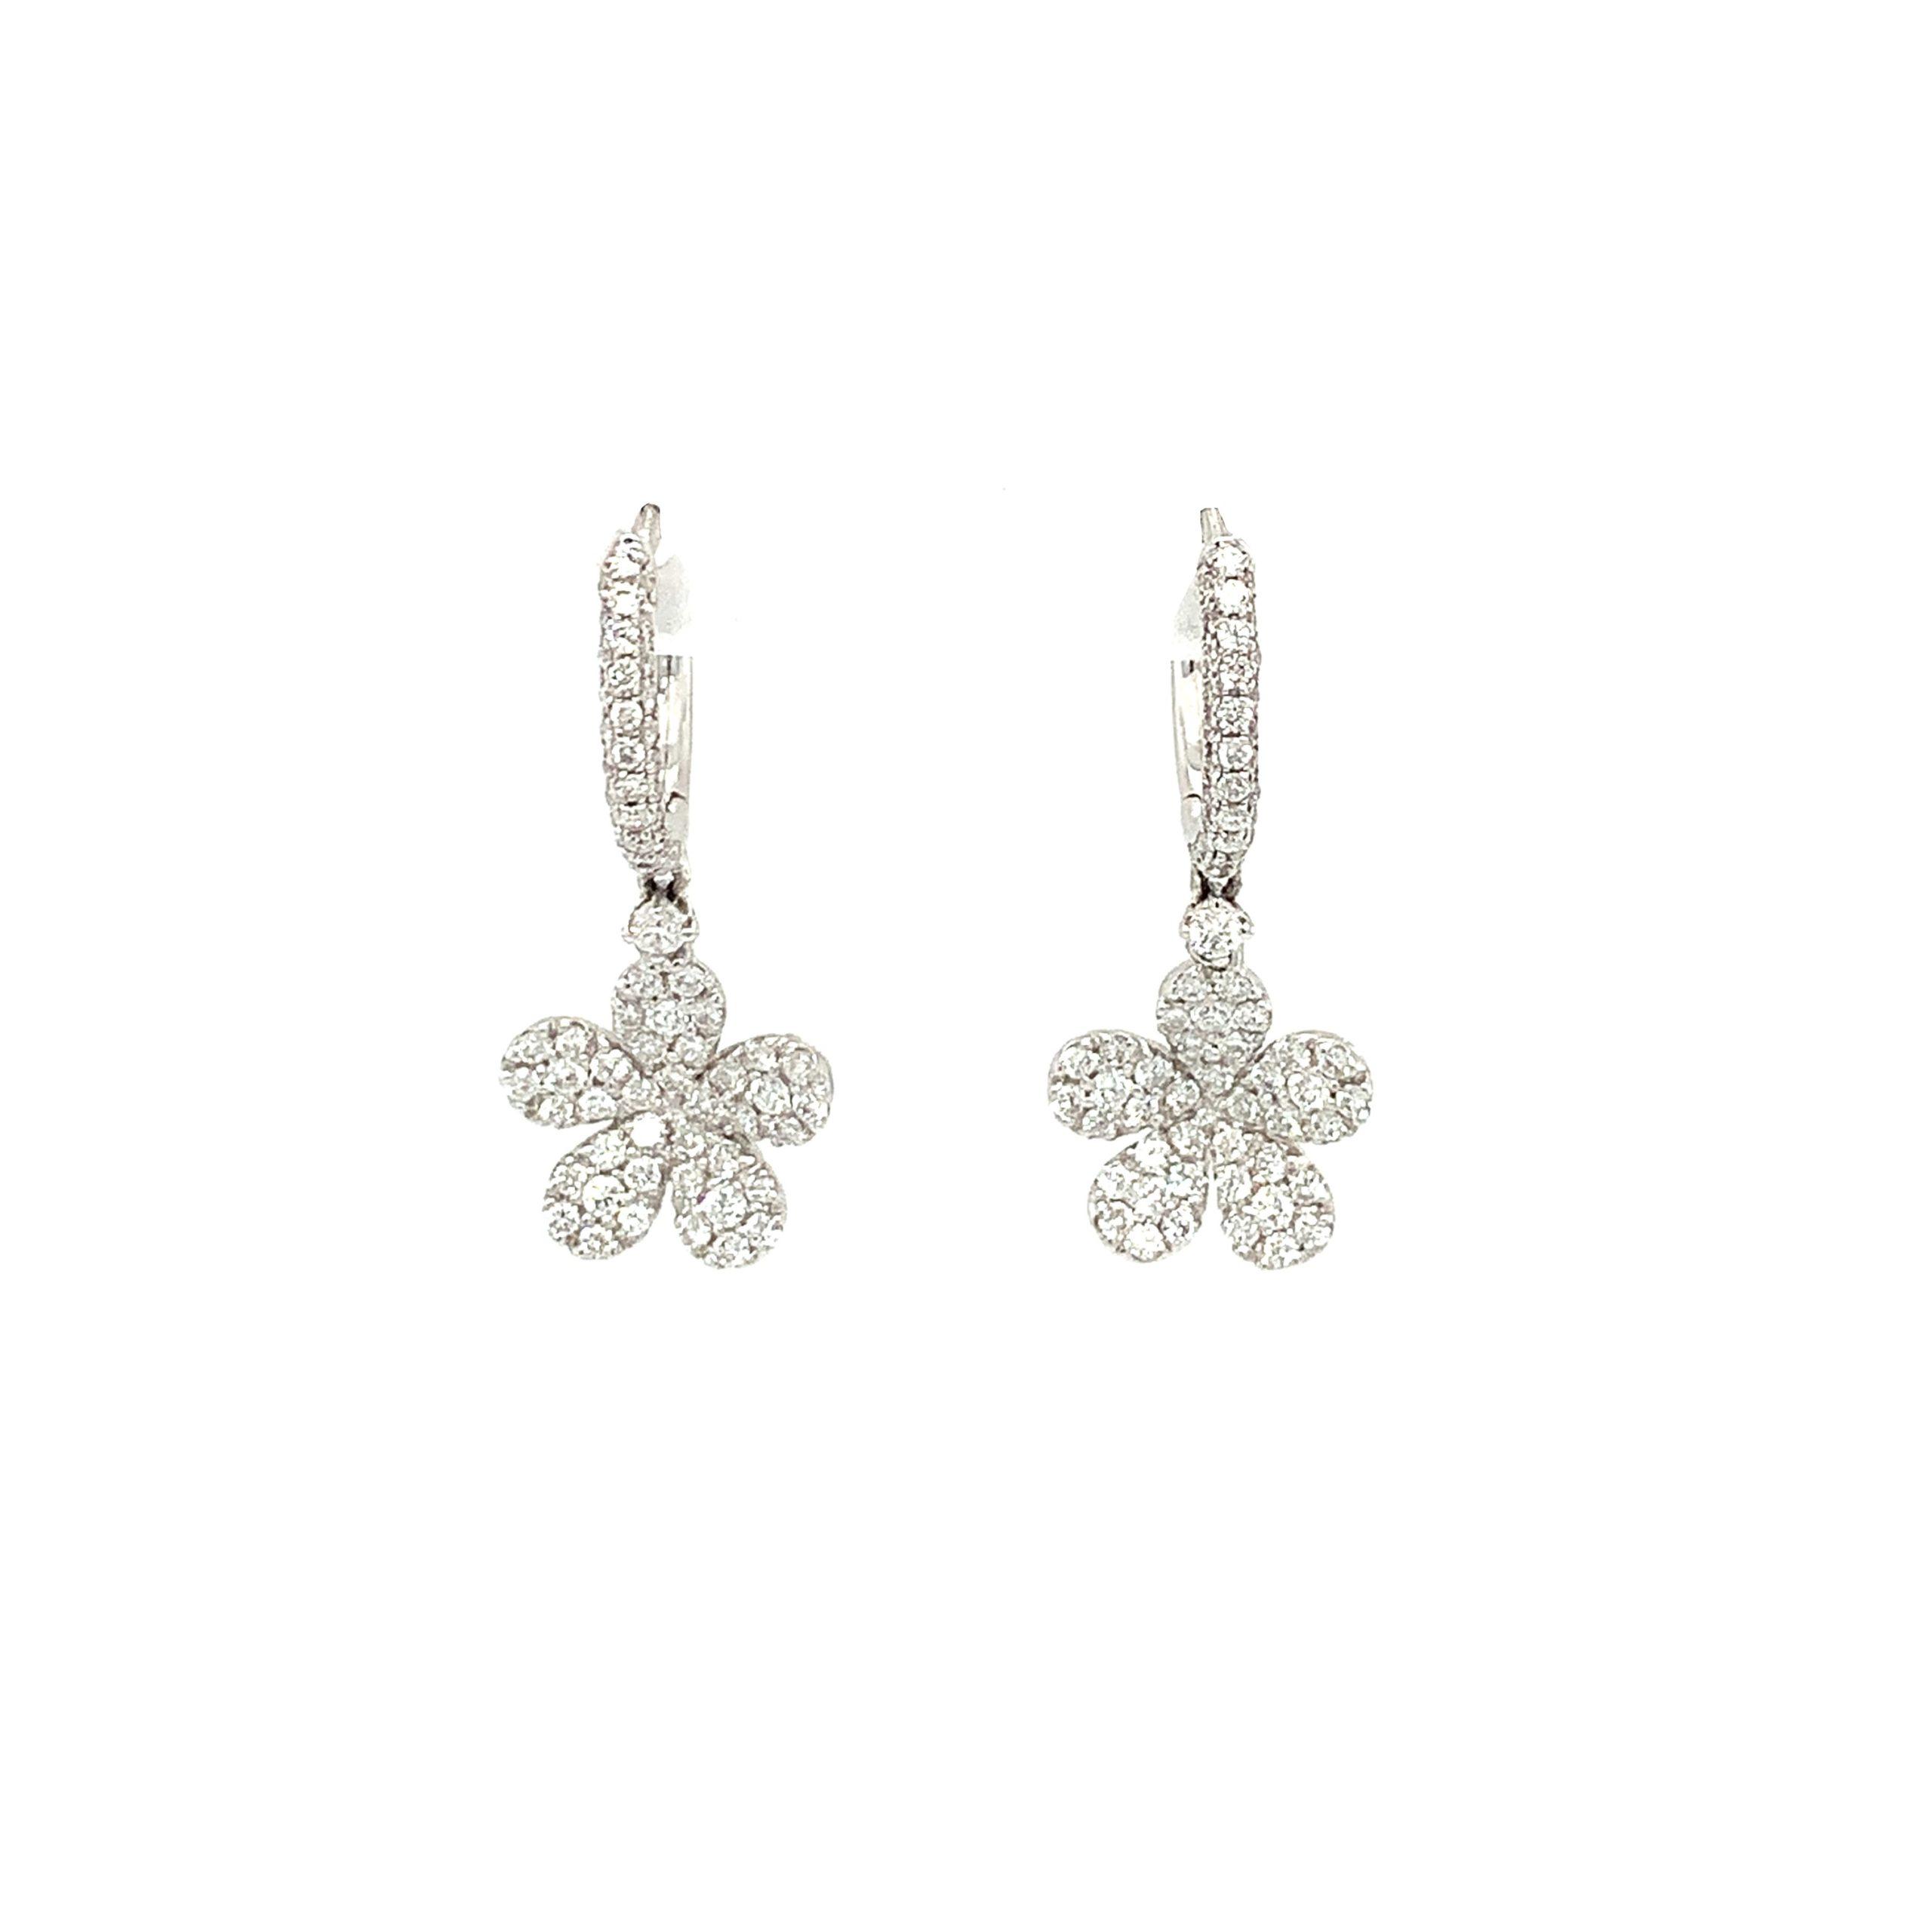 White Gold Diamond Floral Earrings